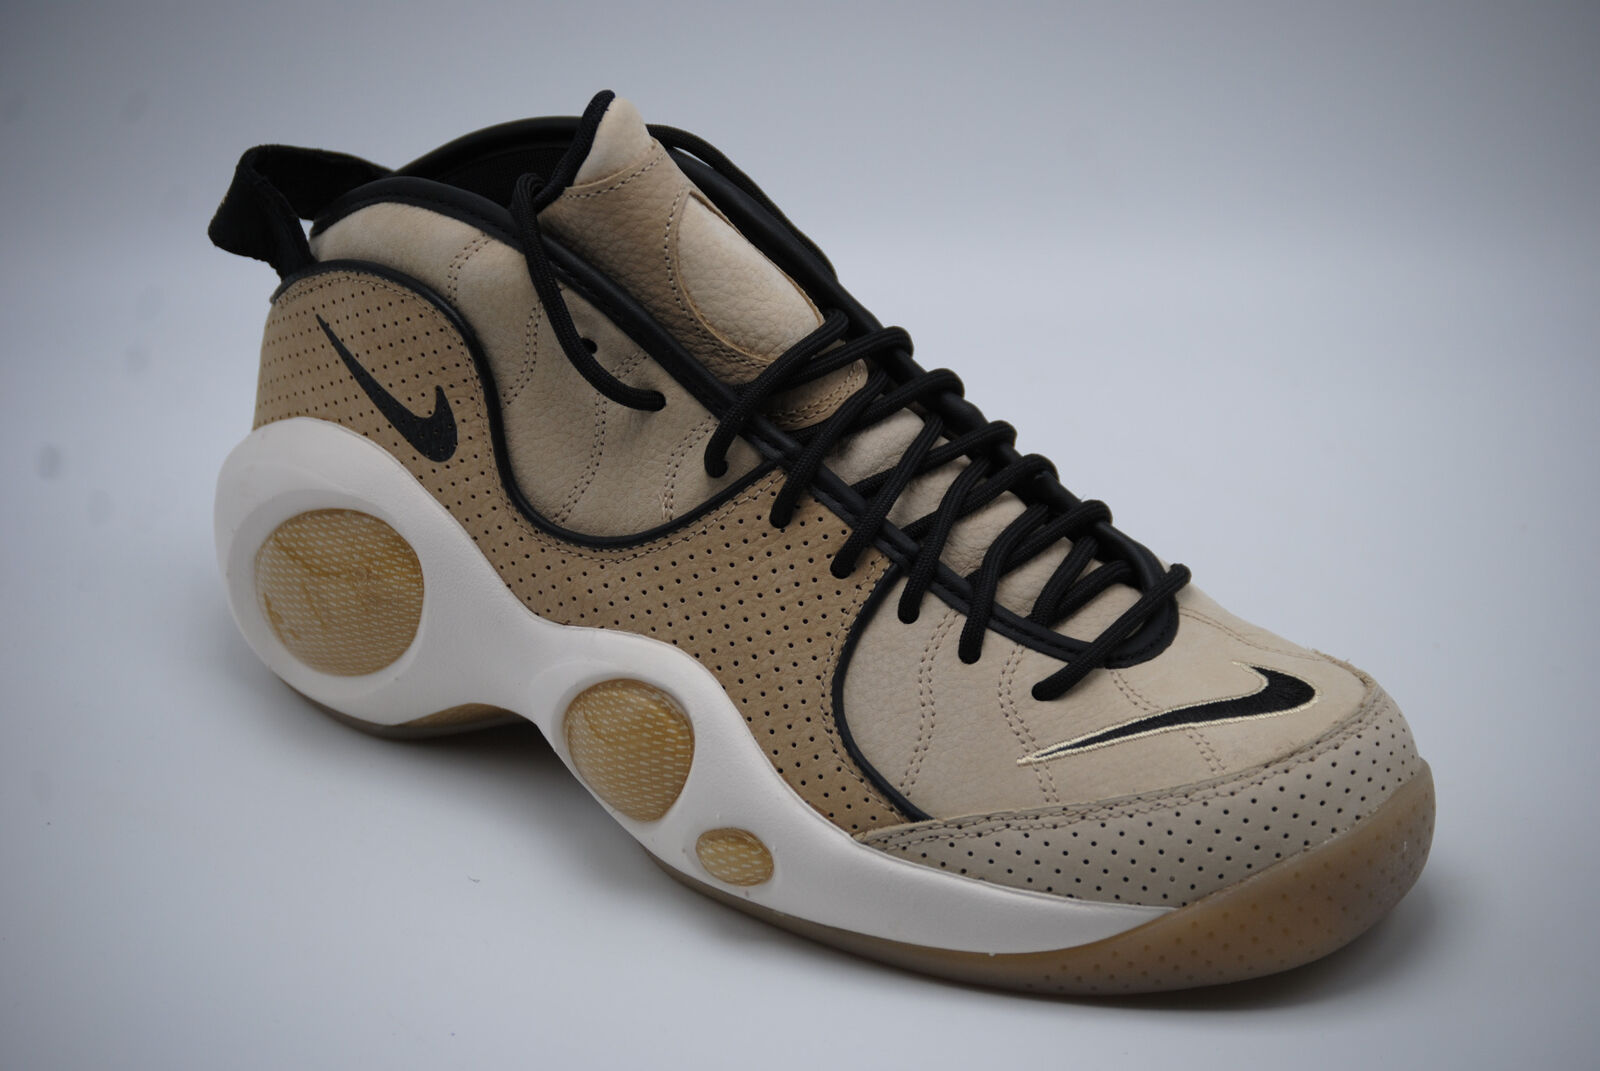 a66dd31956ac Nike Air Zoom Flight 95 Mens Size 9.5 Black Mushroom Sail 941943 001 ...